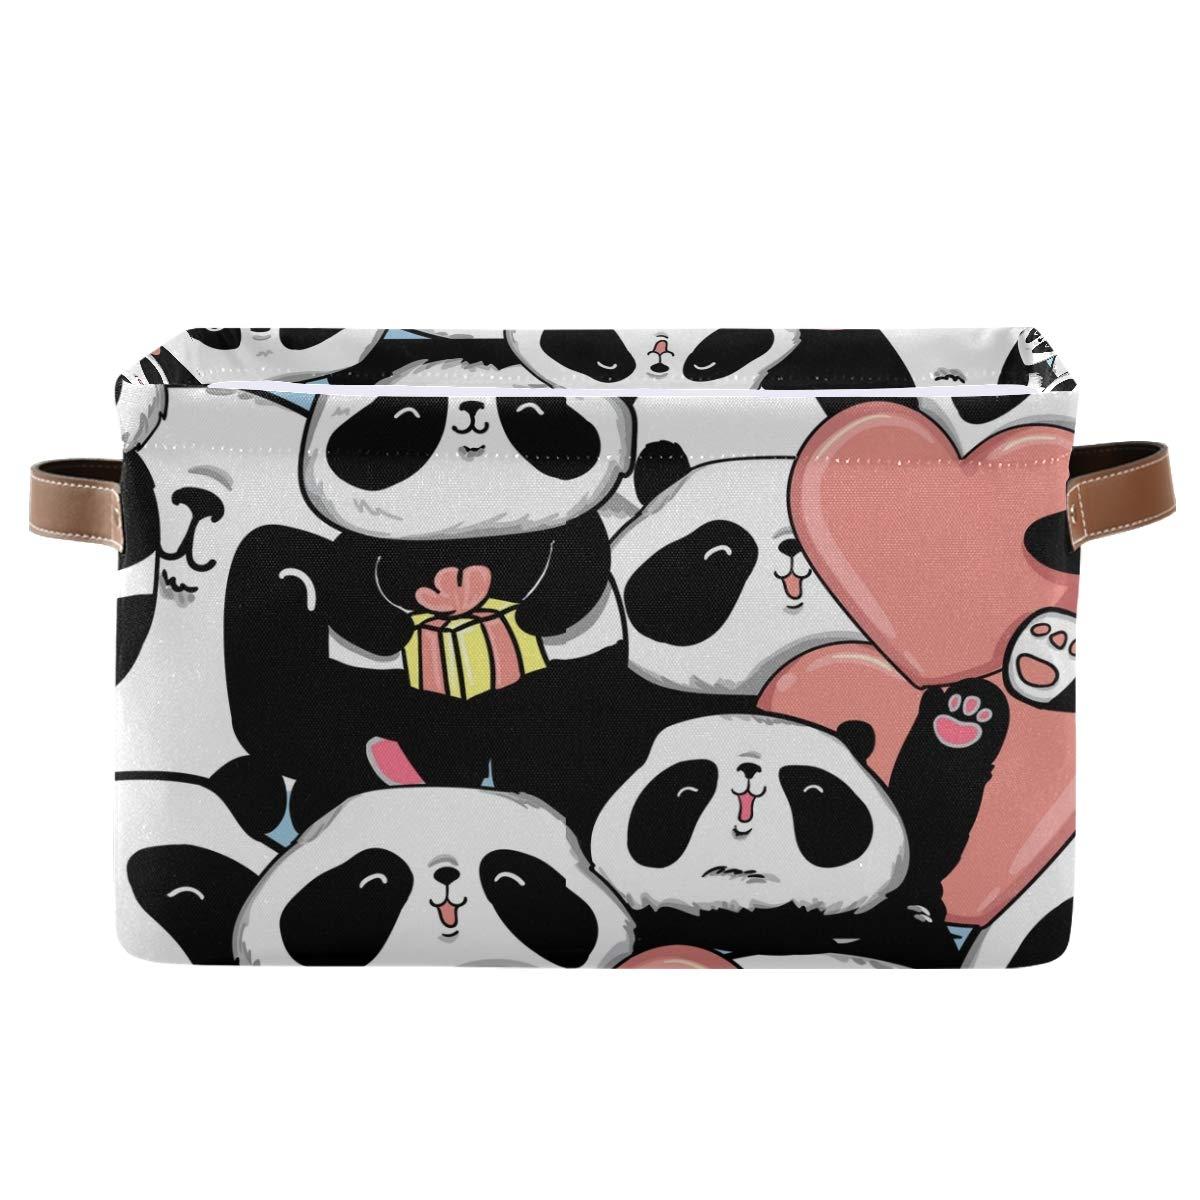 FORMEETY Cute Animal Panda Love Heart Can Detroit Mall Bin Women Storage Kids Max 56% OFF